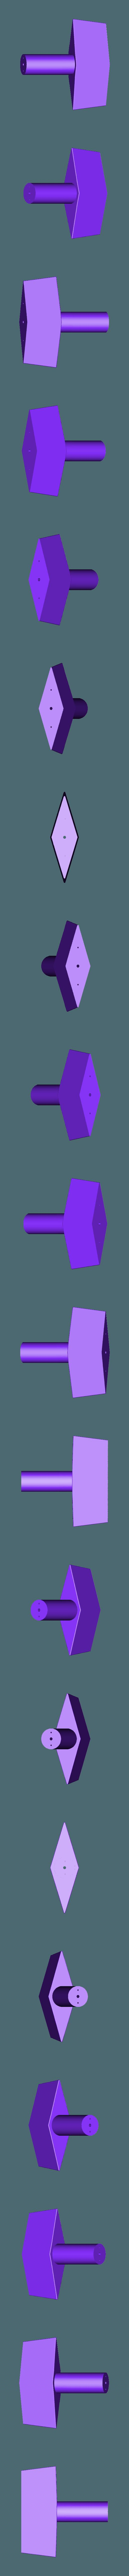 Sharpened Nail 2.stl Download STL file Hollow Knight Sharpened Nail • 3D printable design, glargonoid